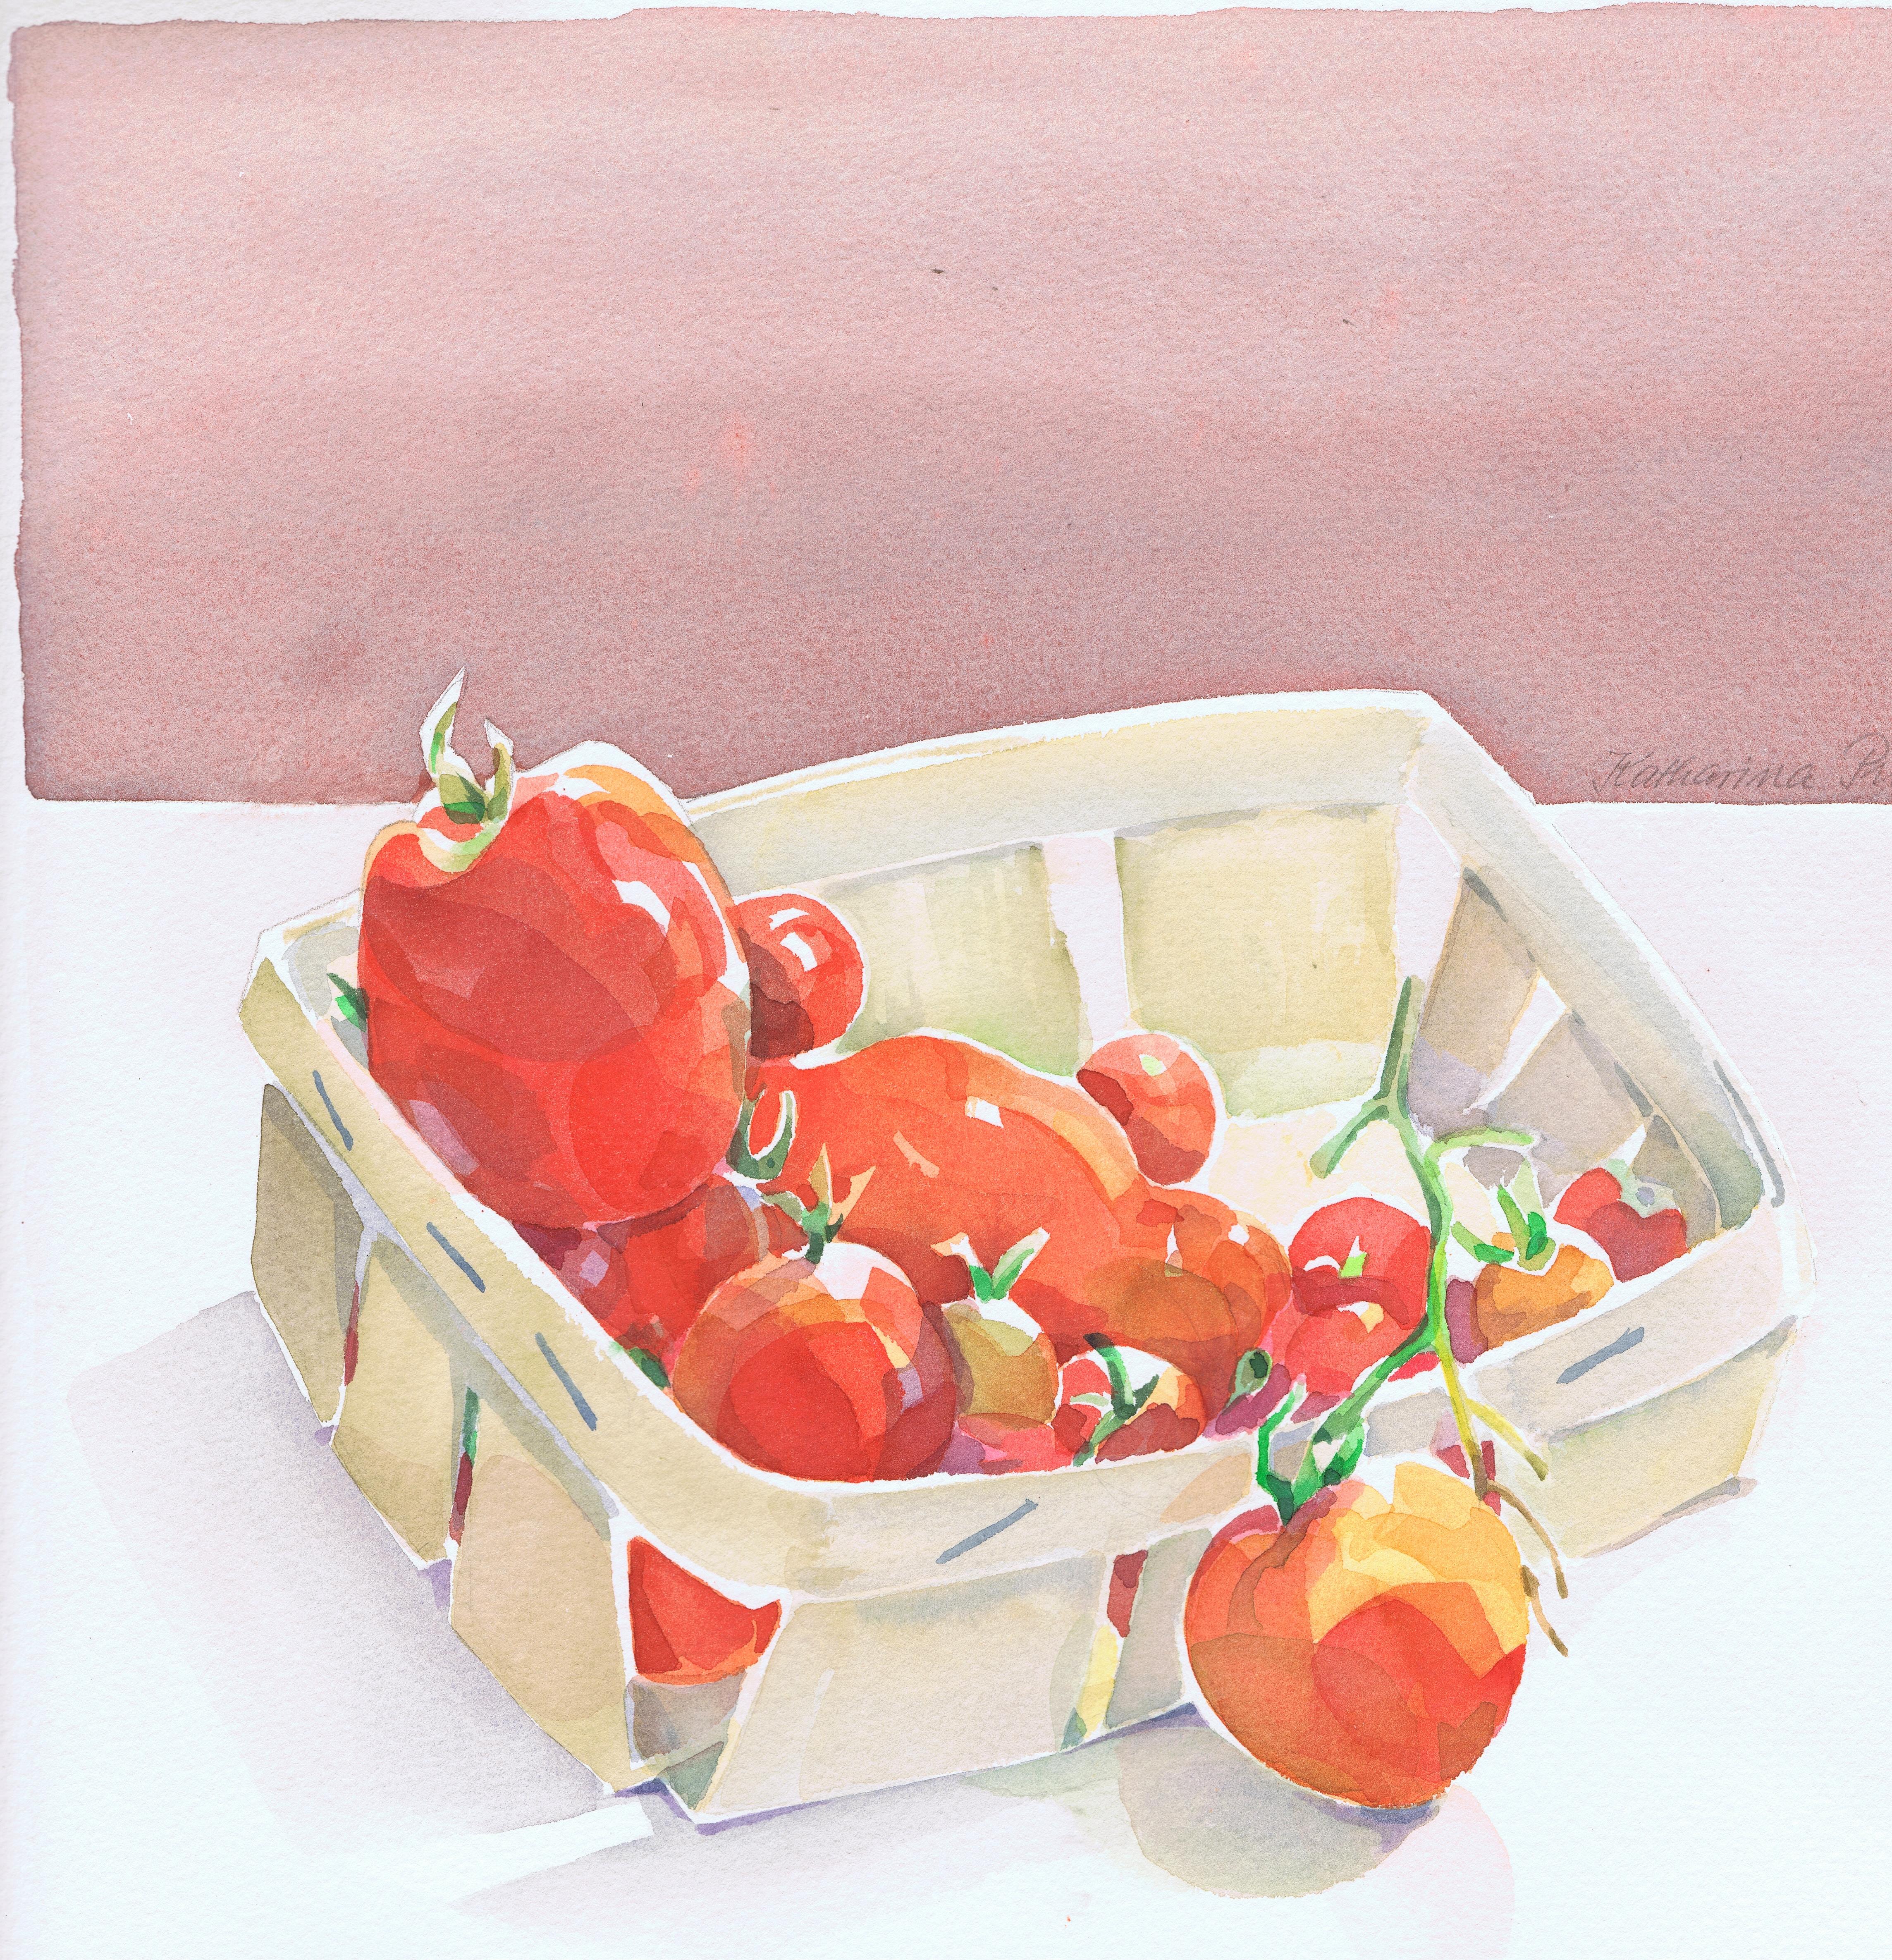 Tomaten im Korb